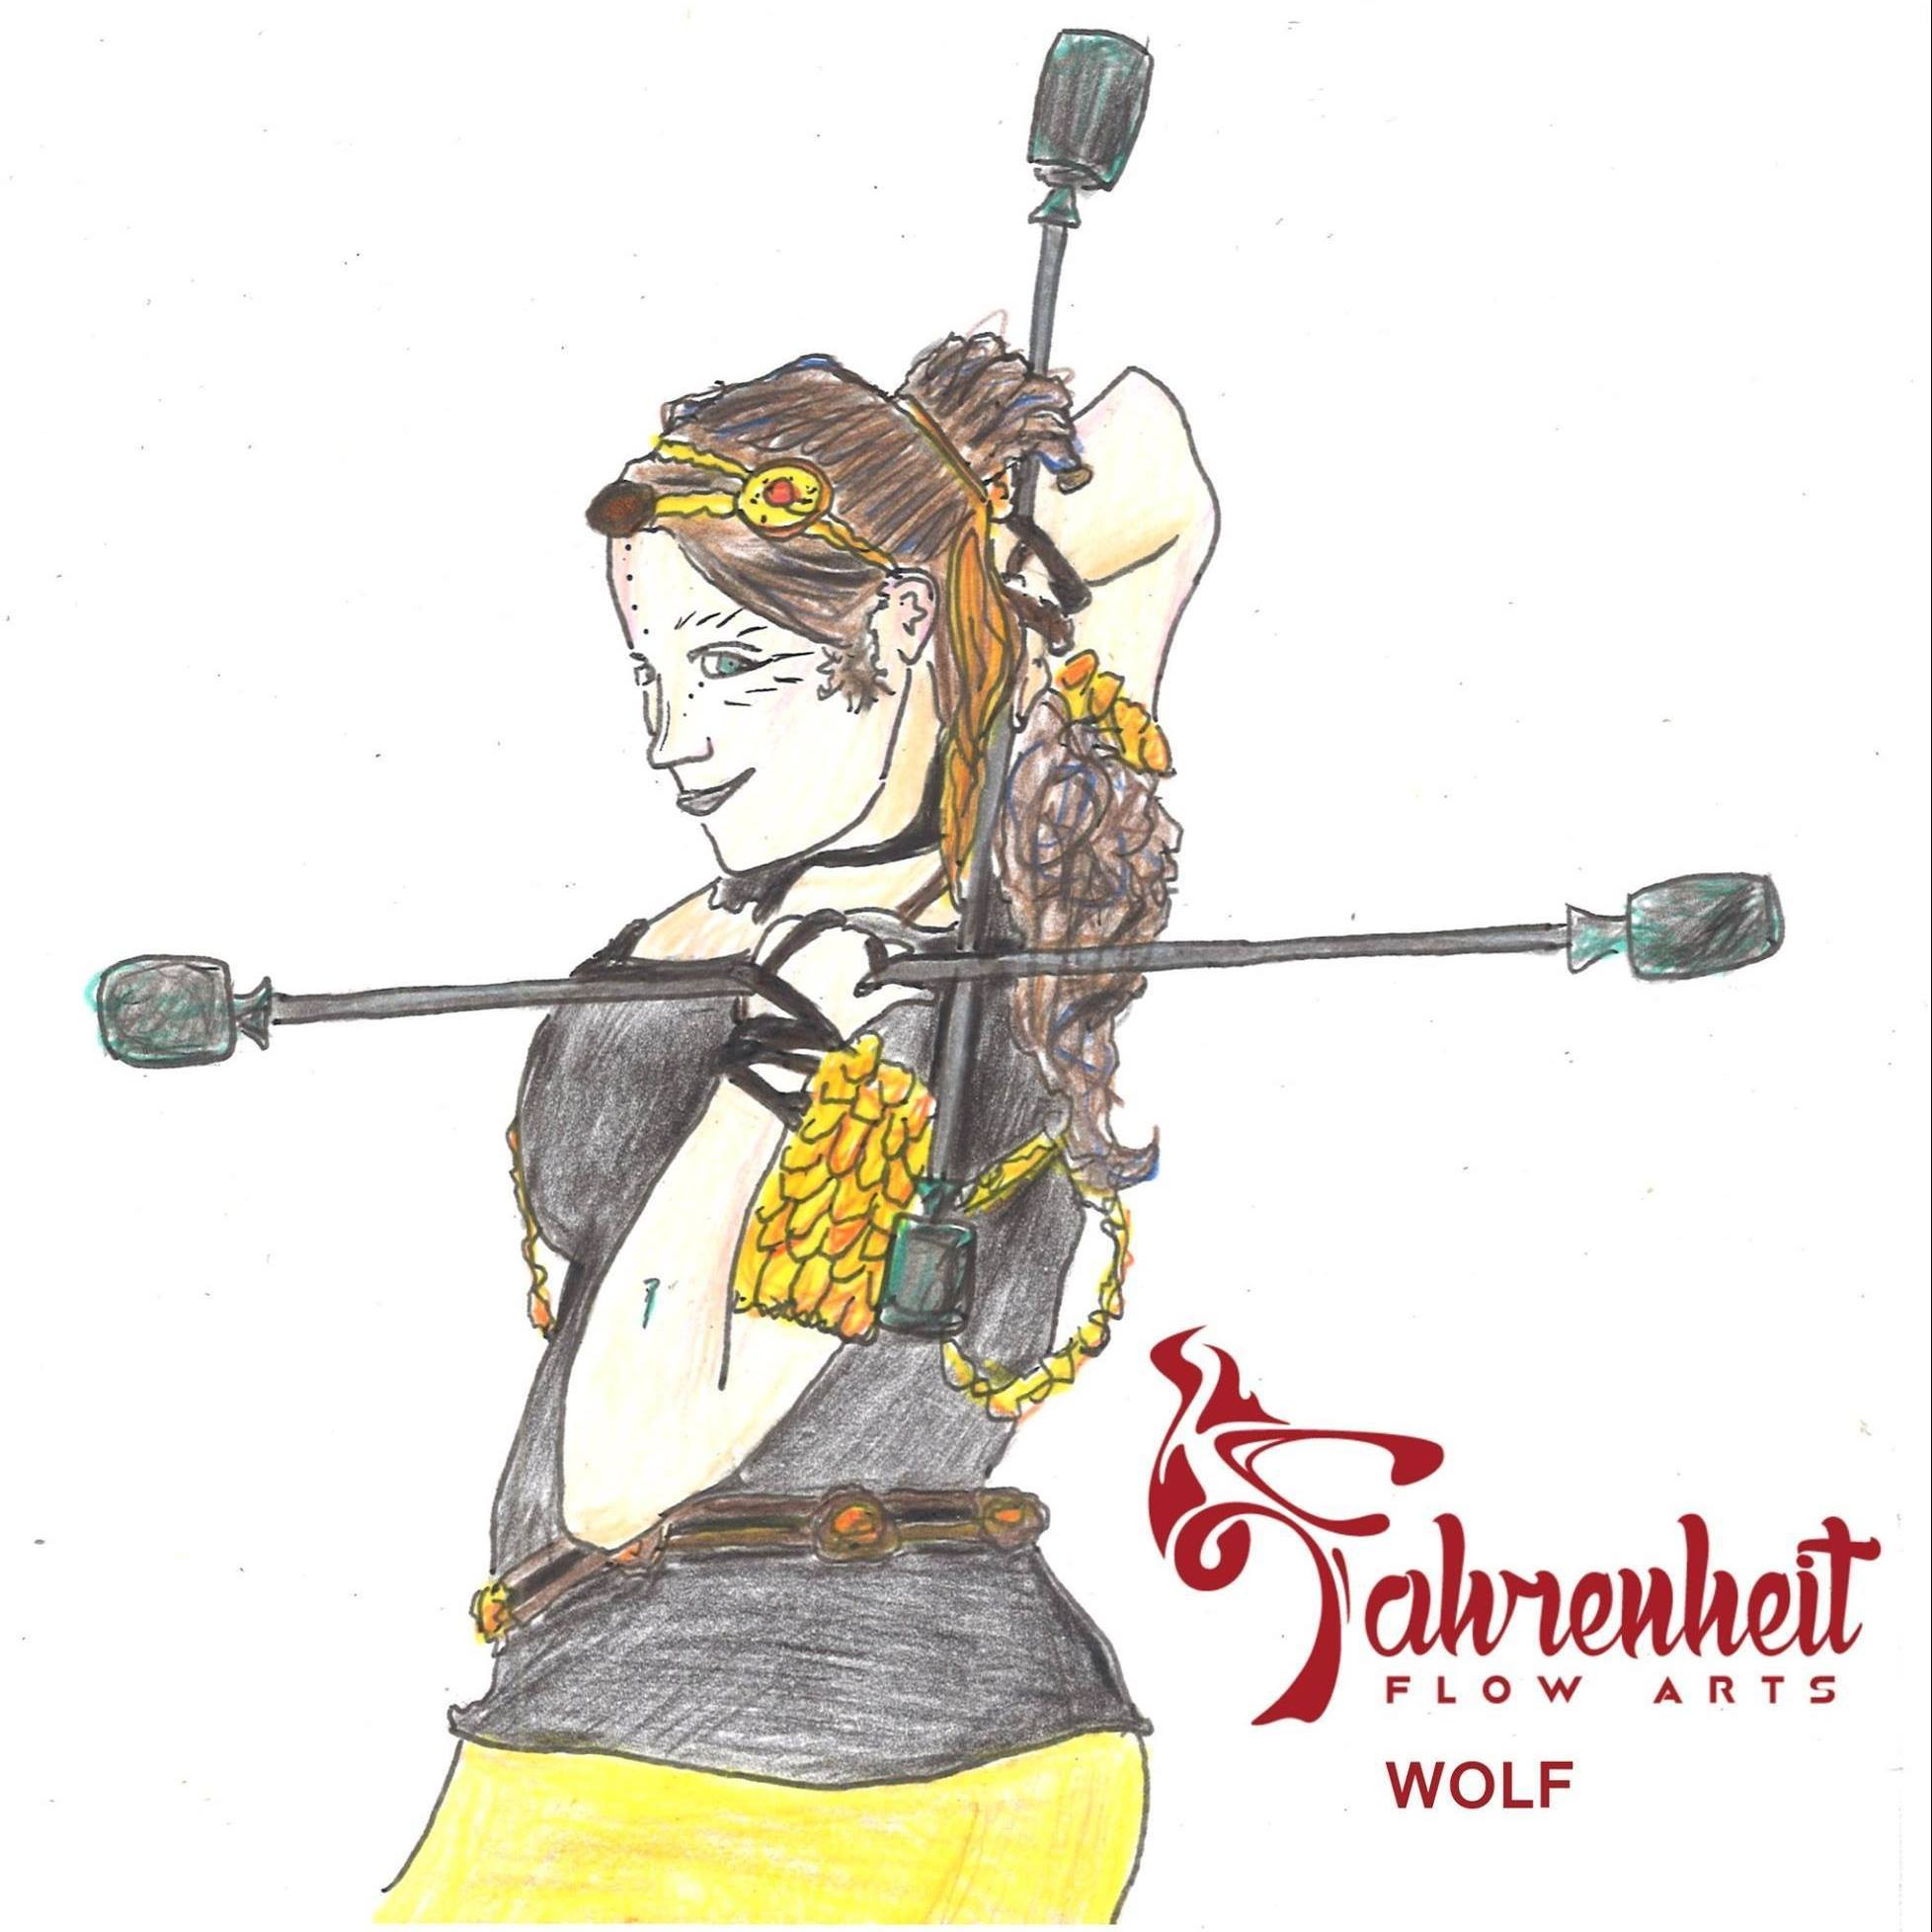 Wolf Bukiet Drawing Fahrenheit